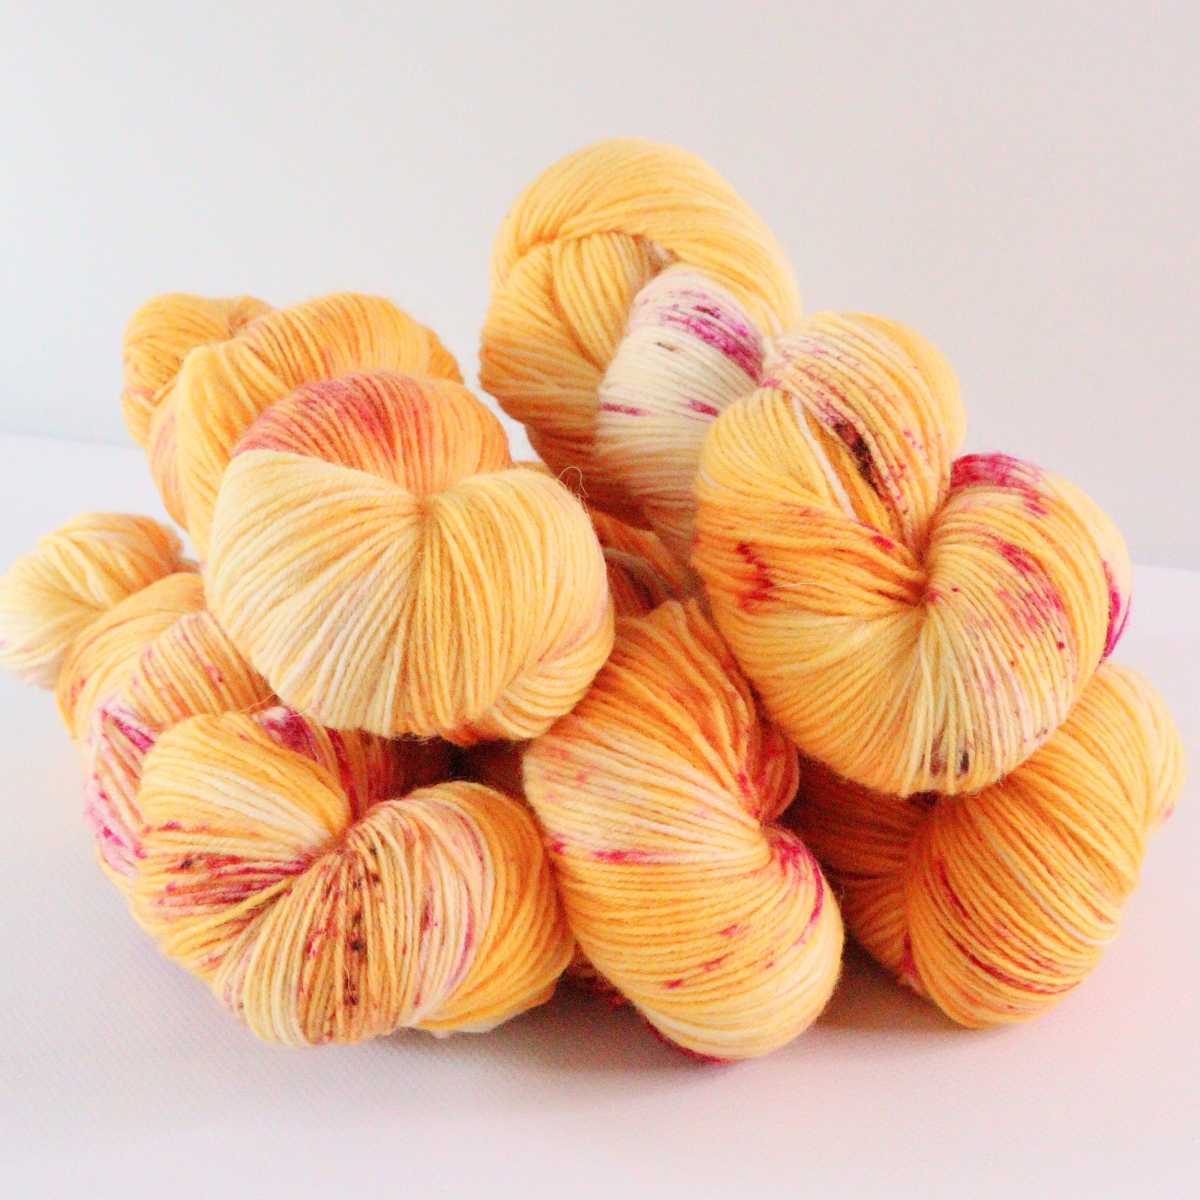 woodico.pro hand dyed yarn 077 1 1200x1200 - Hand dyed yarn / 077